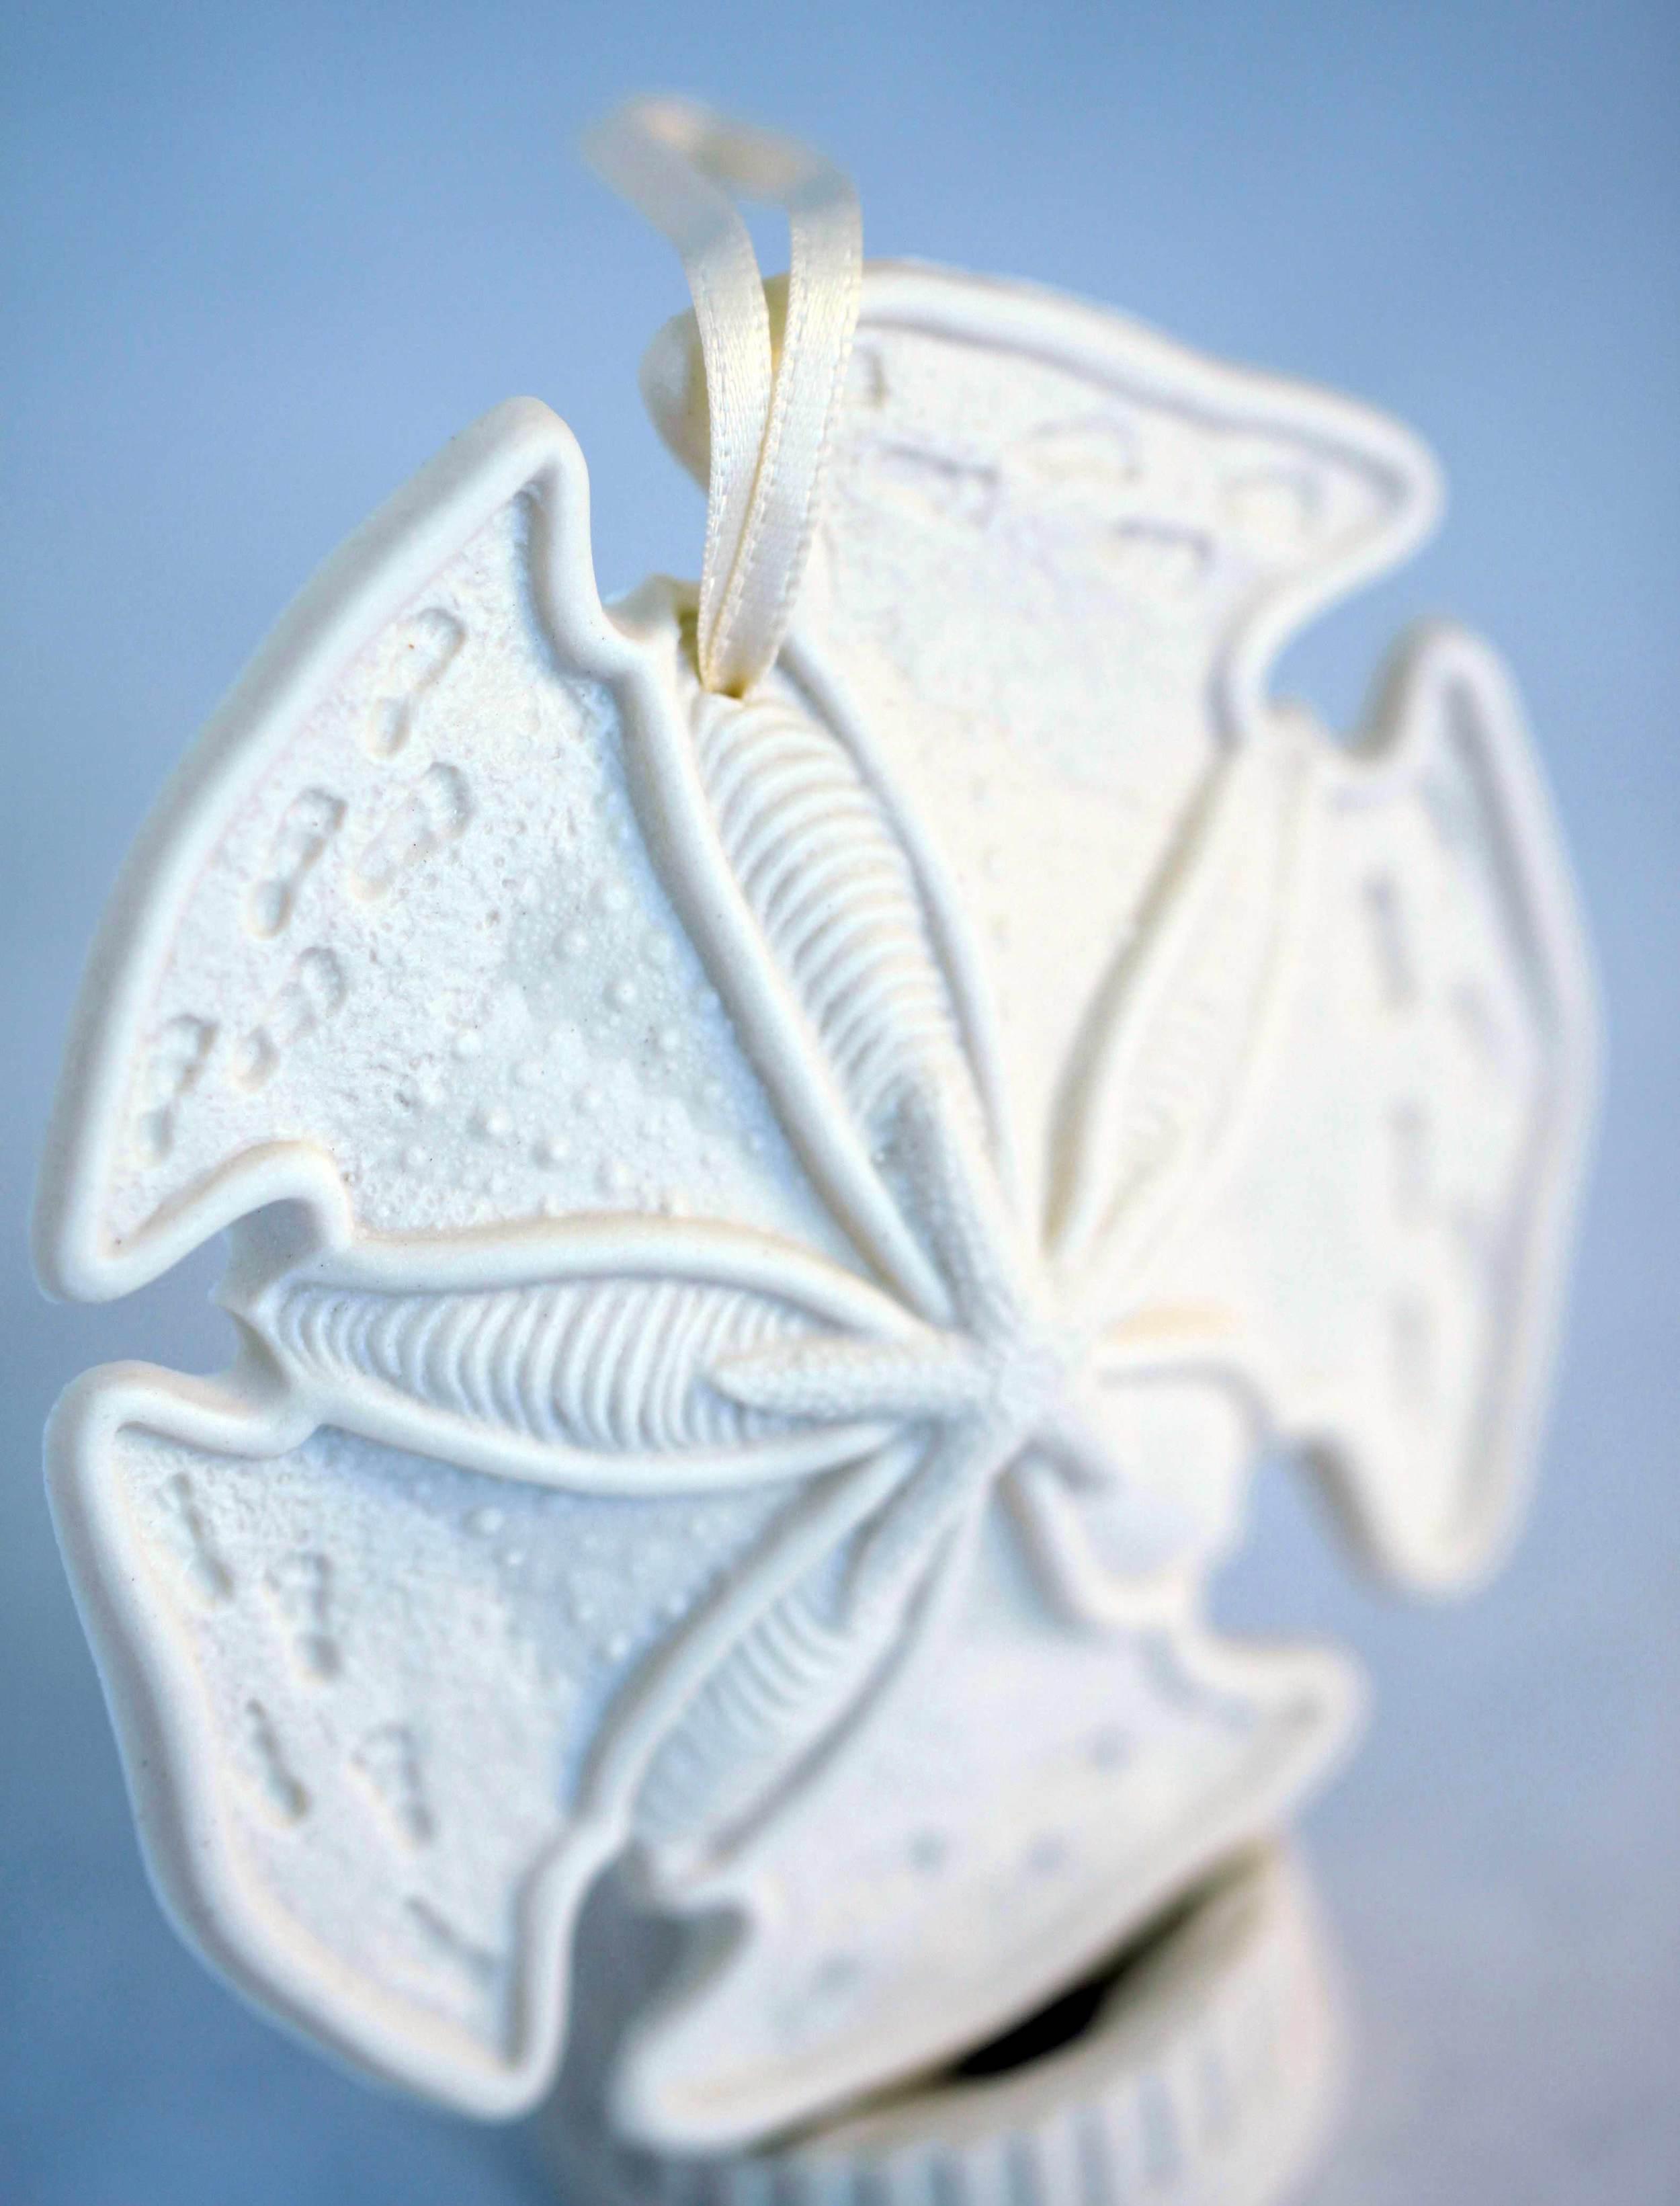 dear-friend-sand-dollar-porcelain-shell-ornament